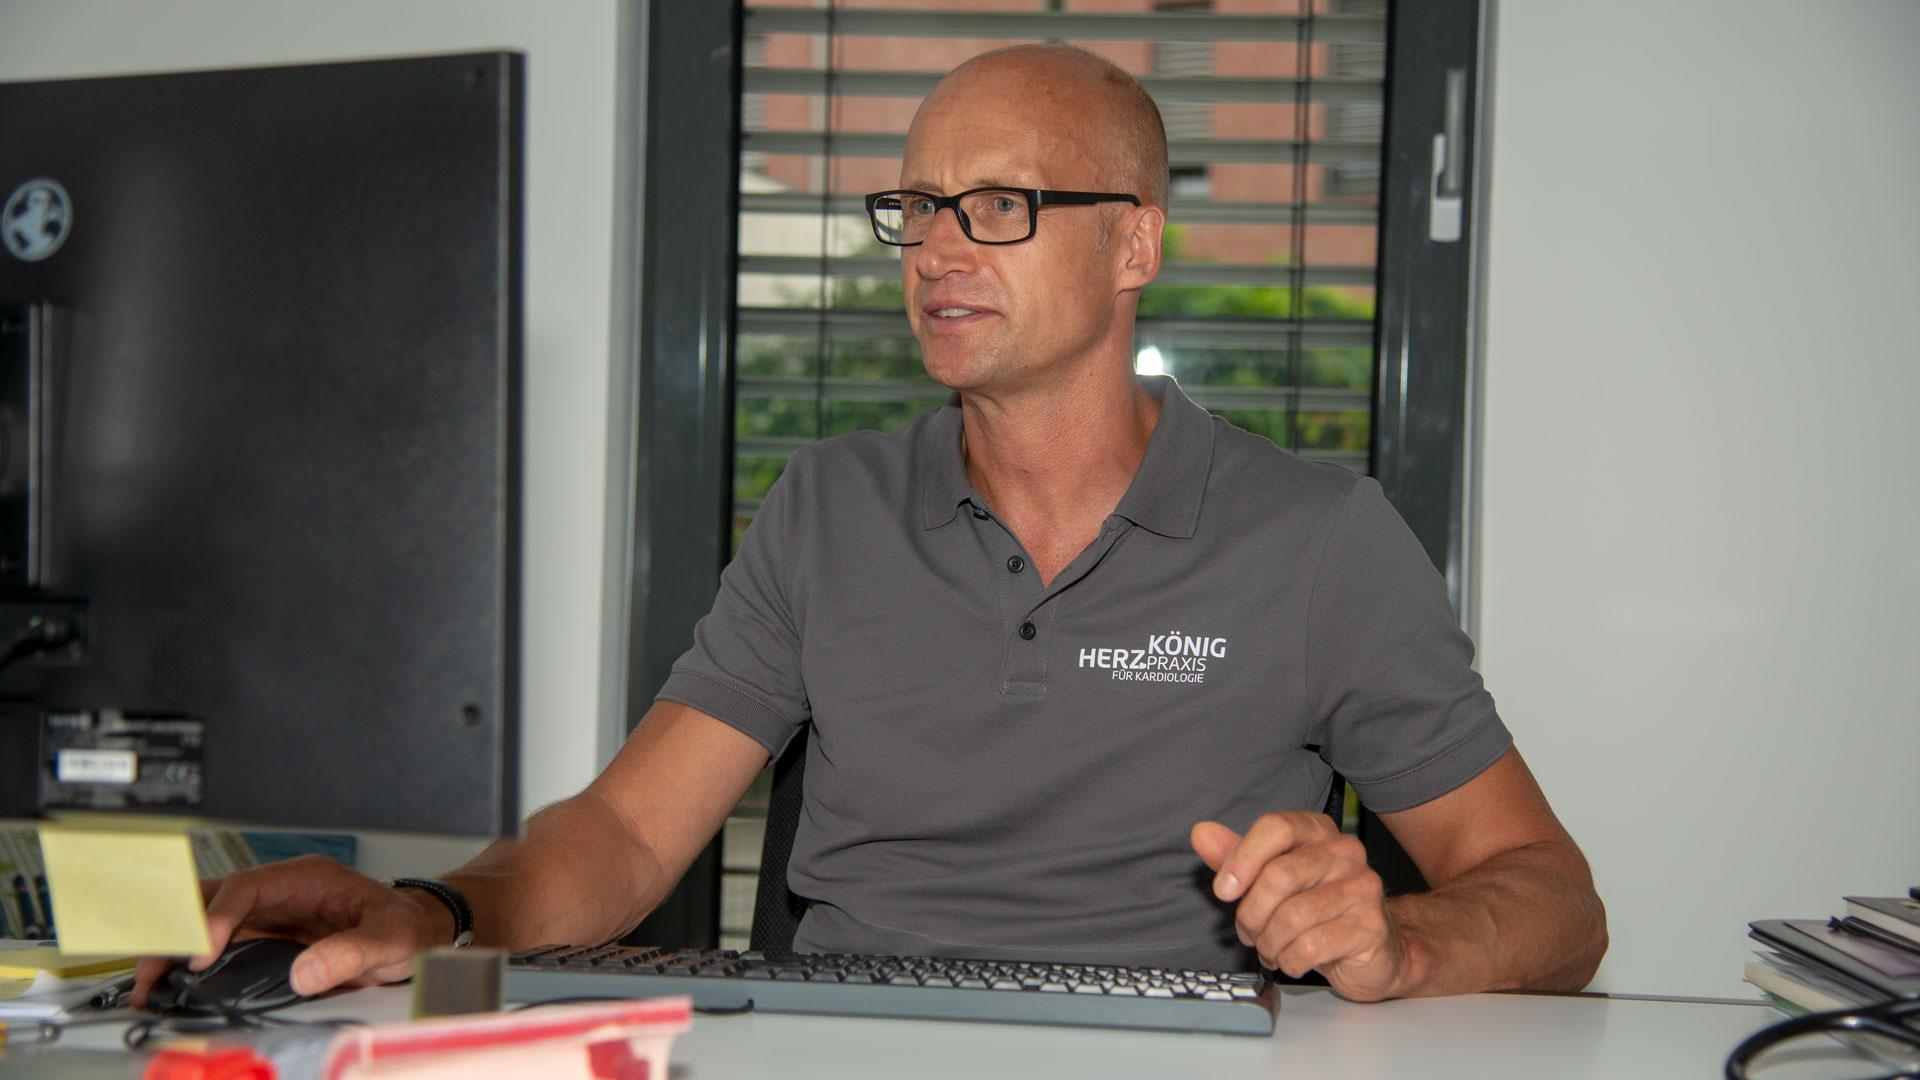 Dr. Kai König am PC